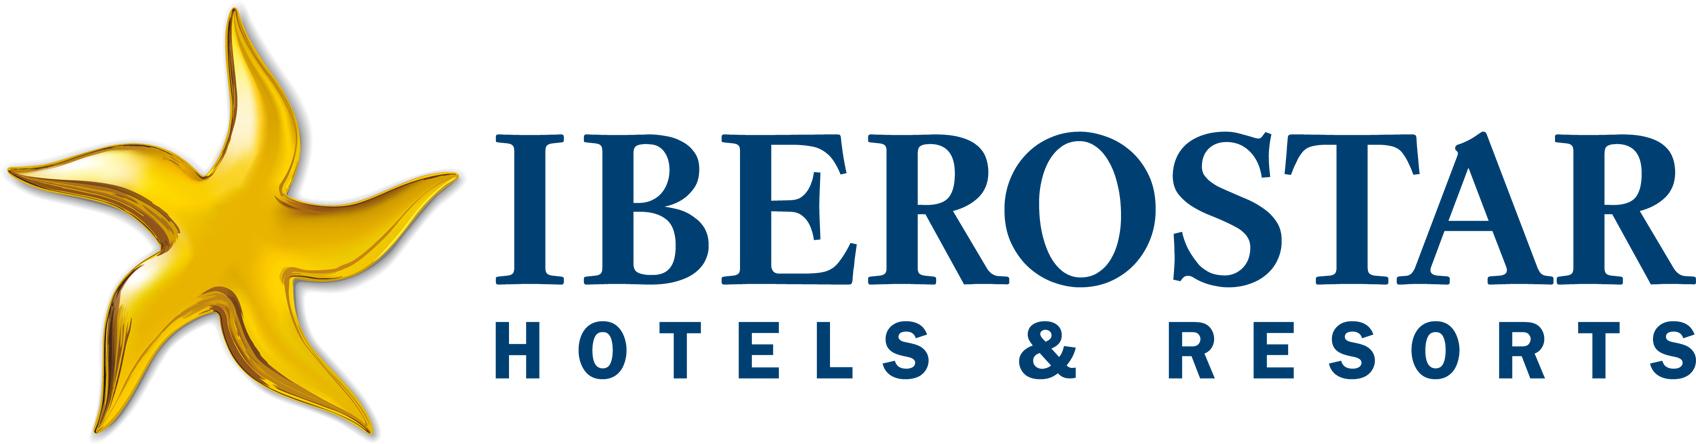 iberostar_logo